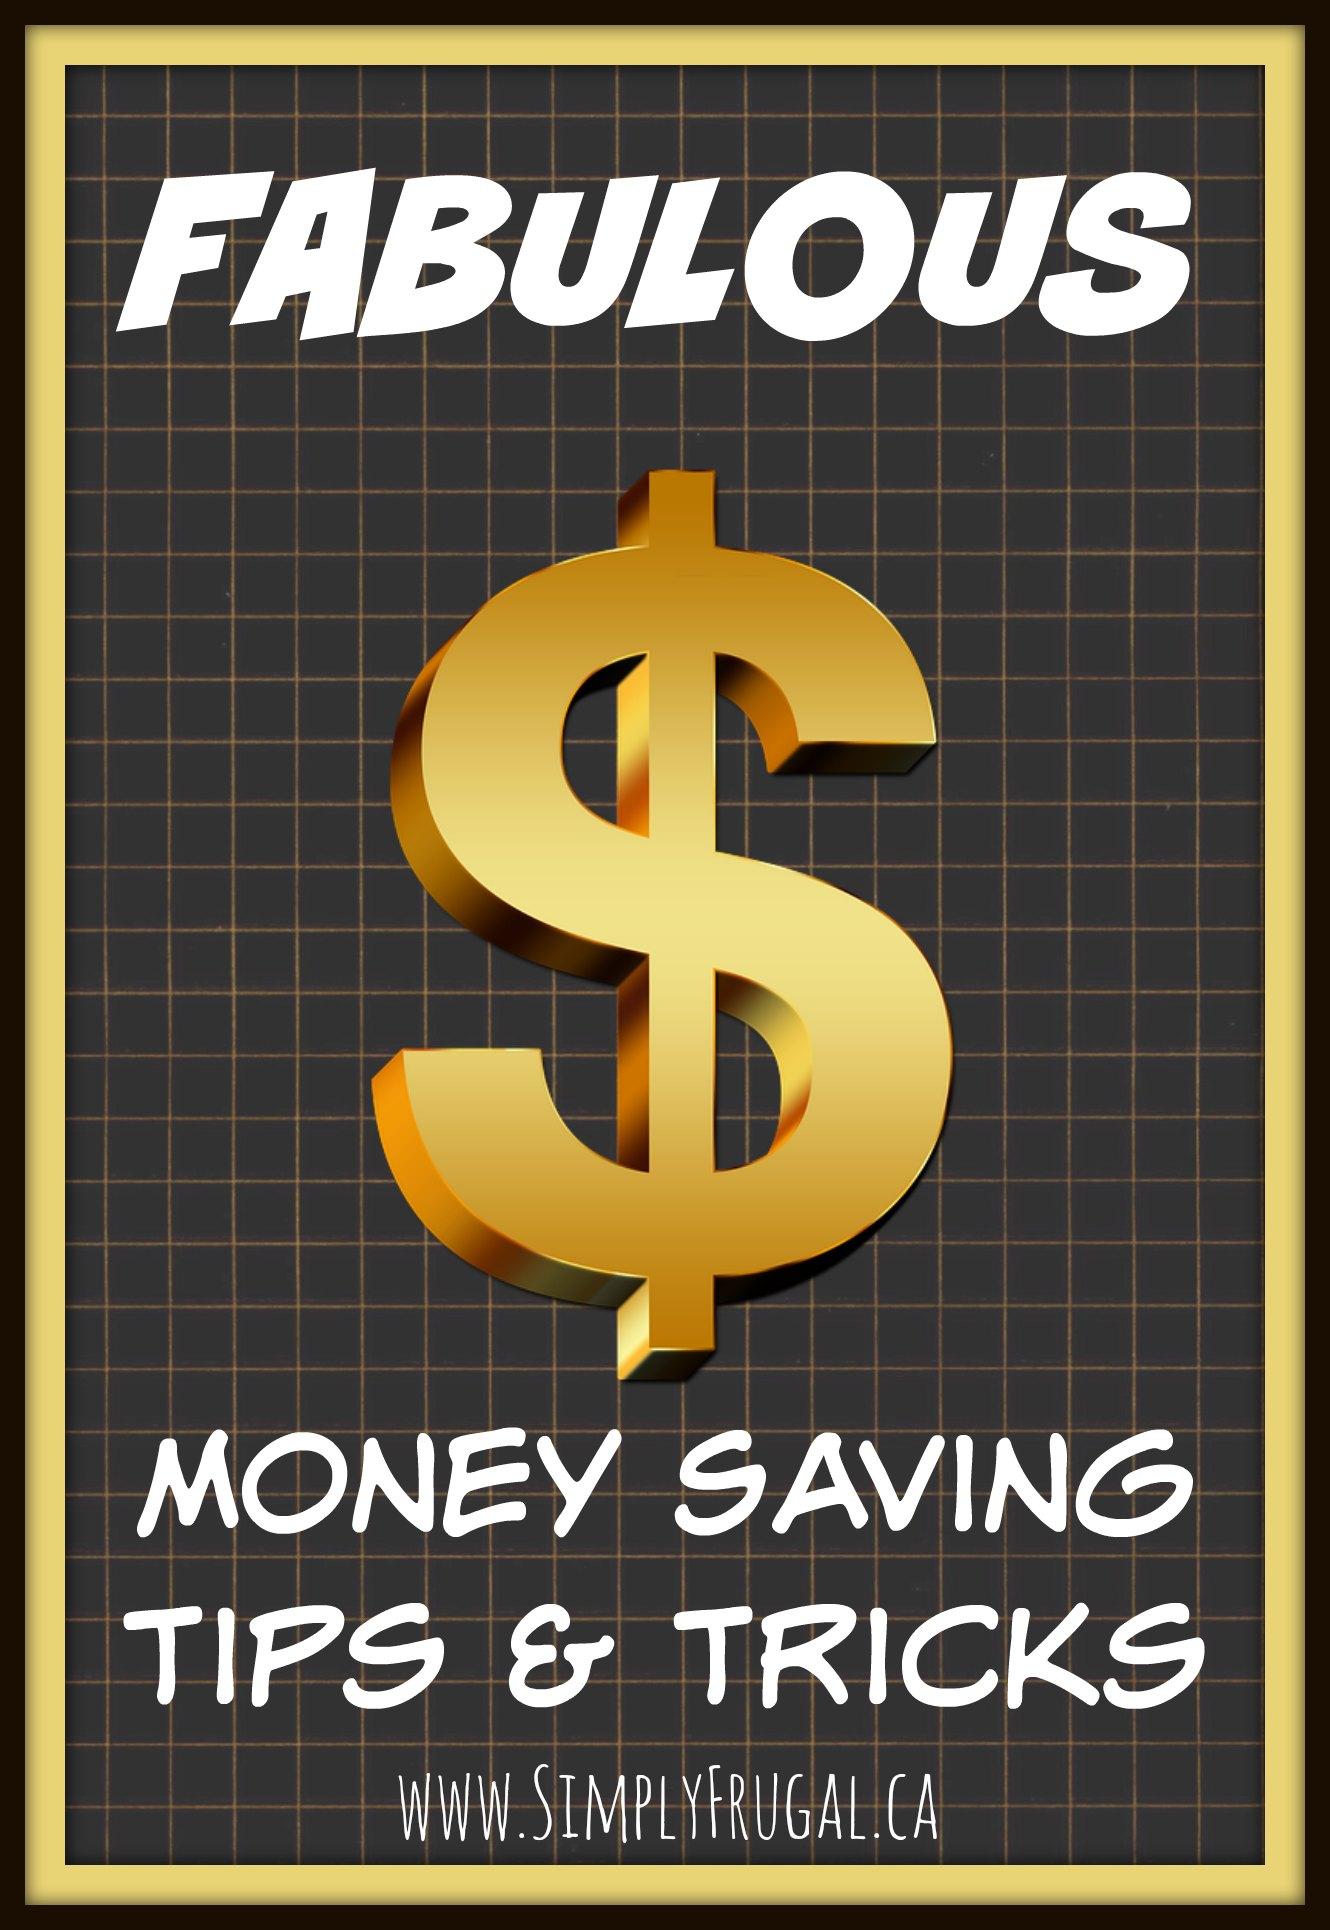 Money saving tips & tricks